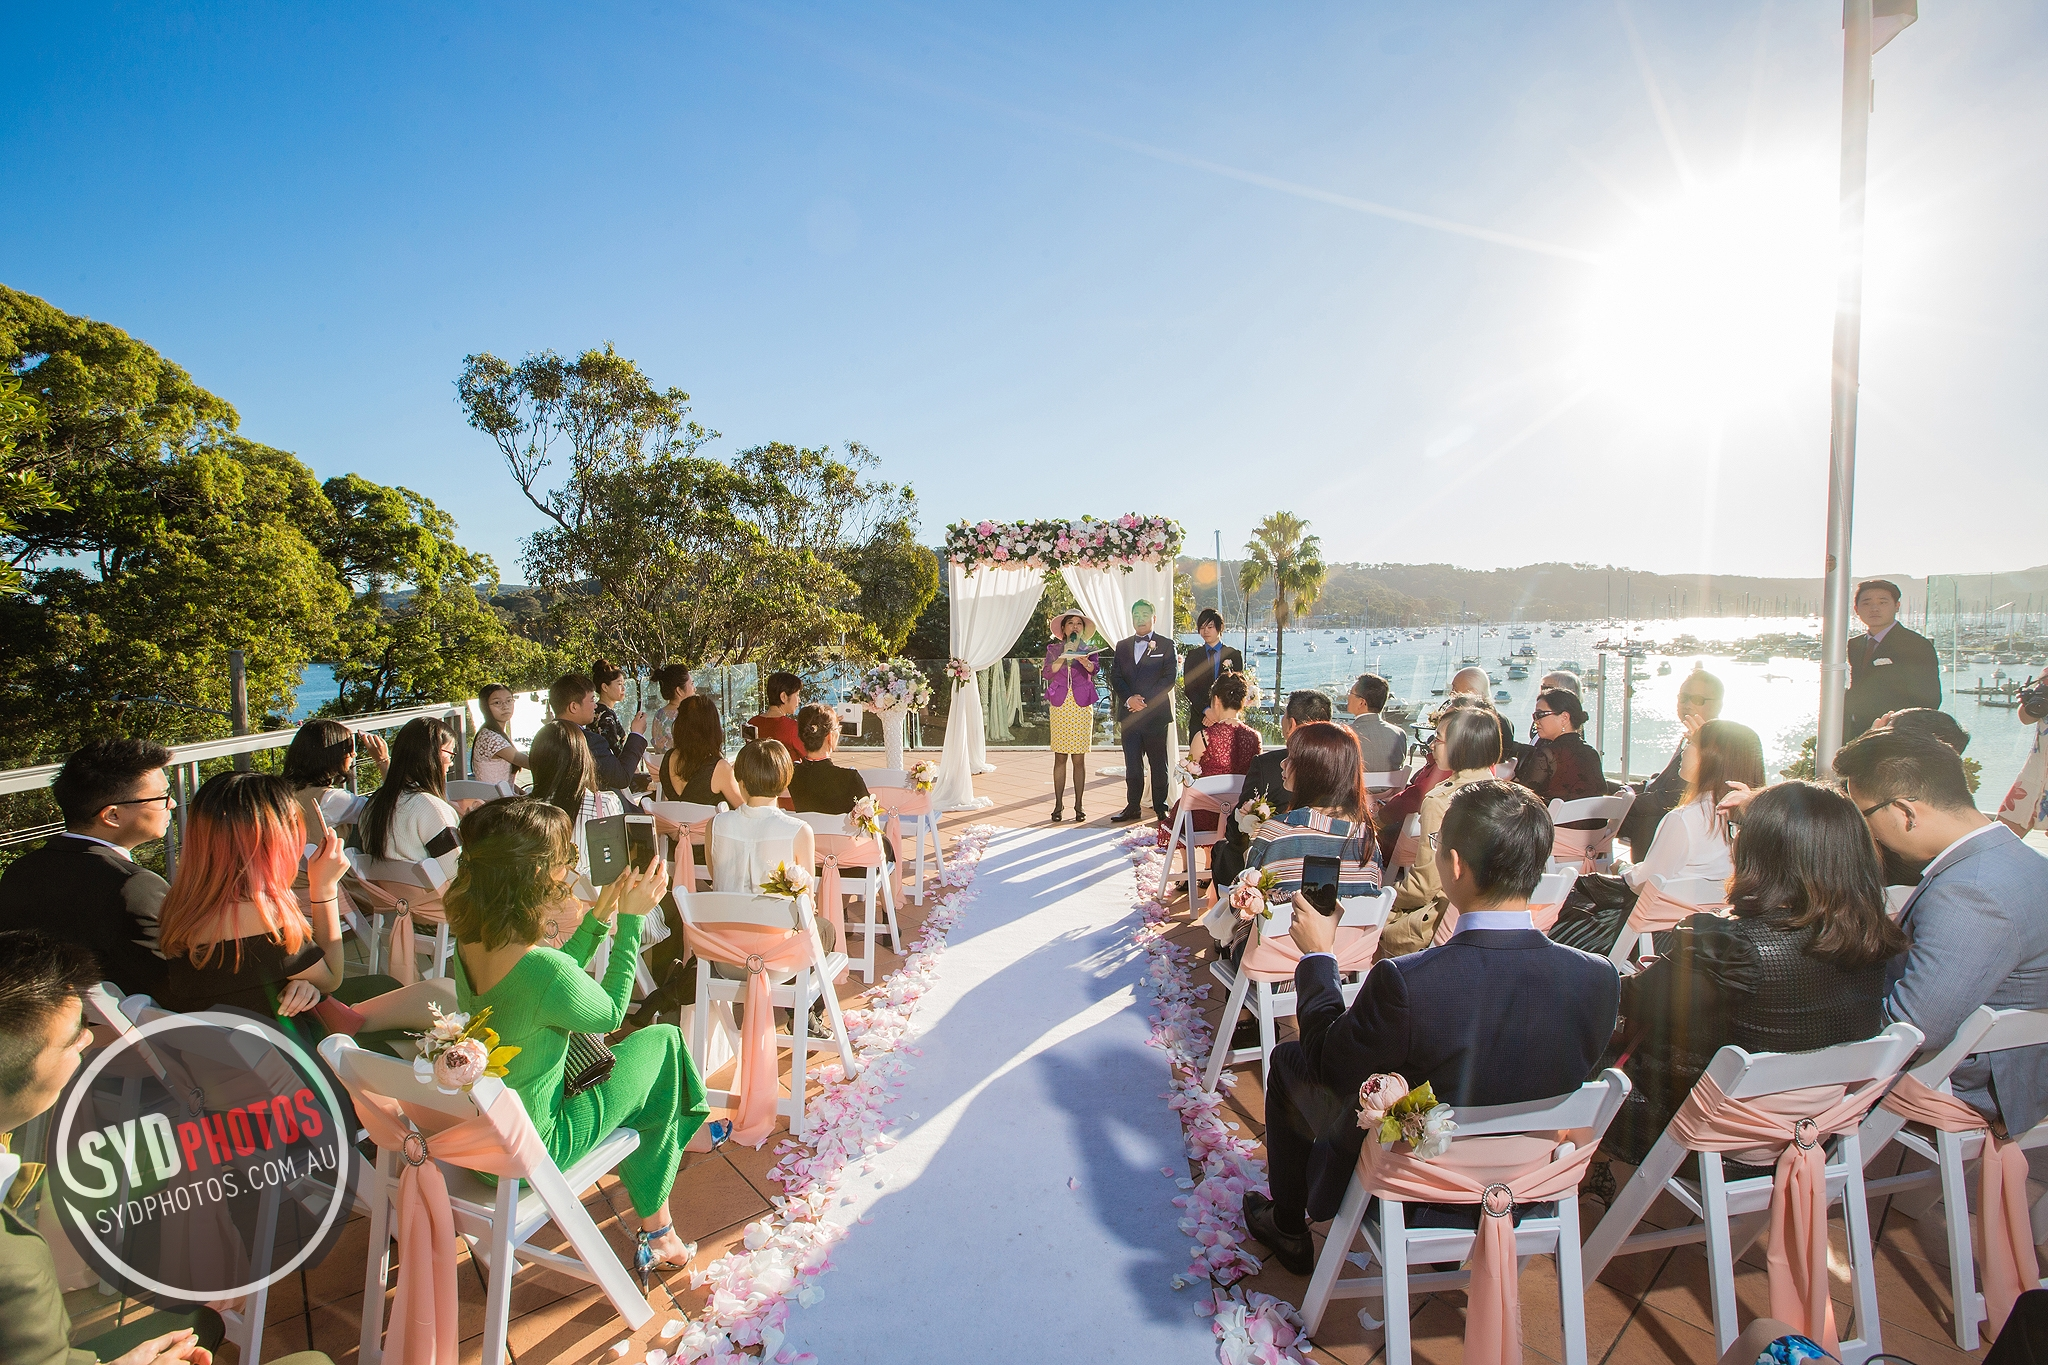 ID-86175-WENDY-Wedding-悉尼婚礼摄影